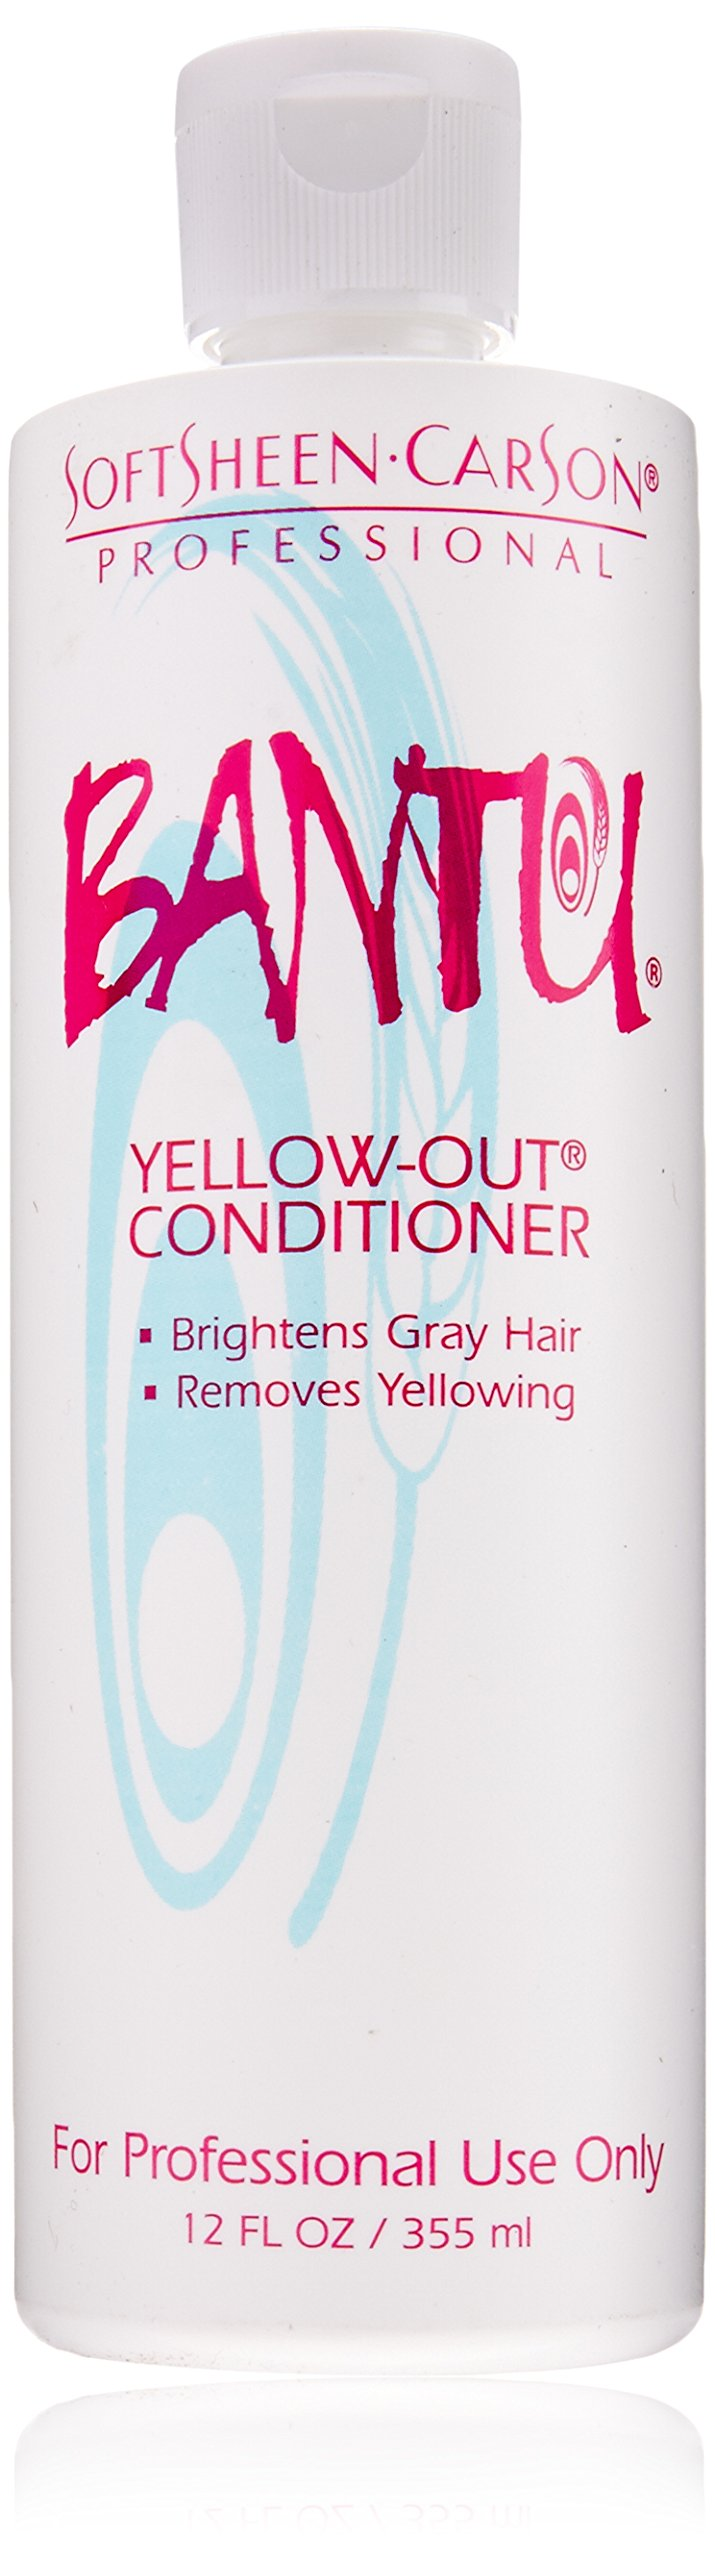 Softsheen Carson Bantu Yellow Out